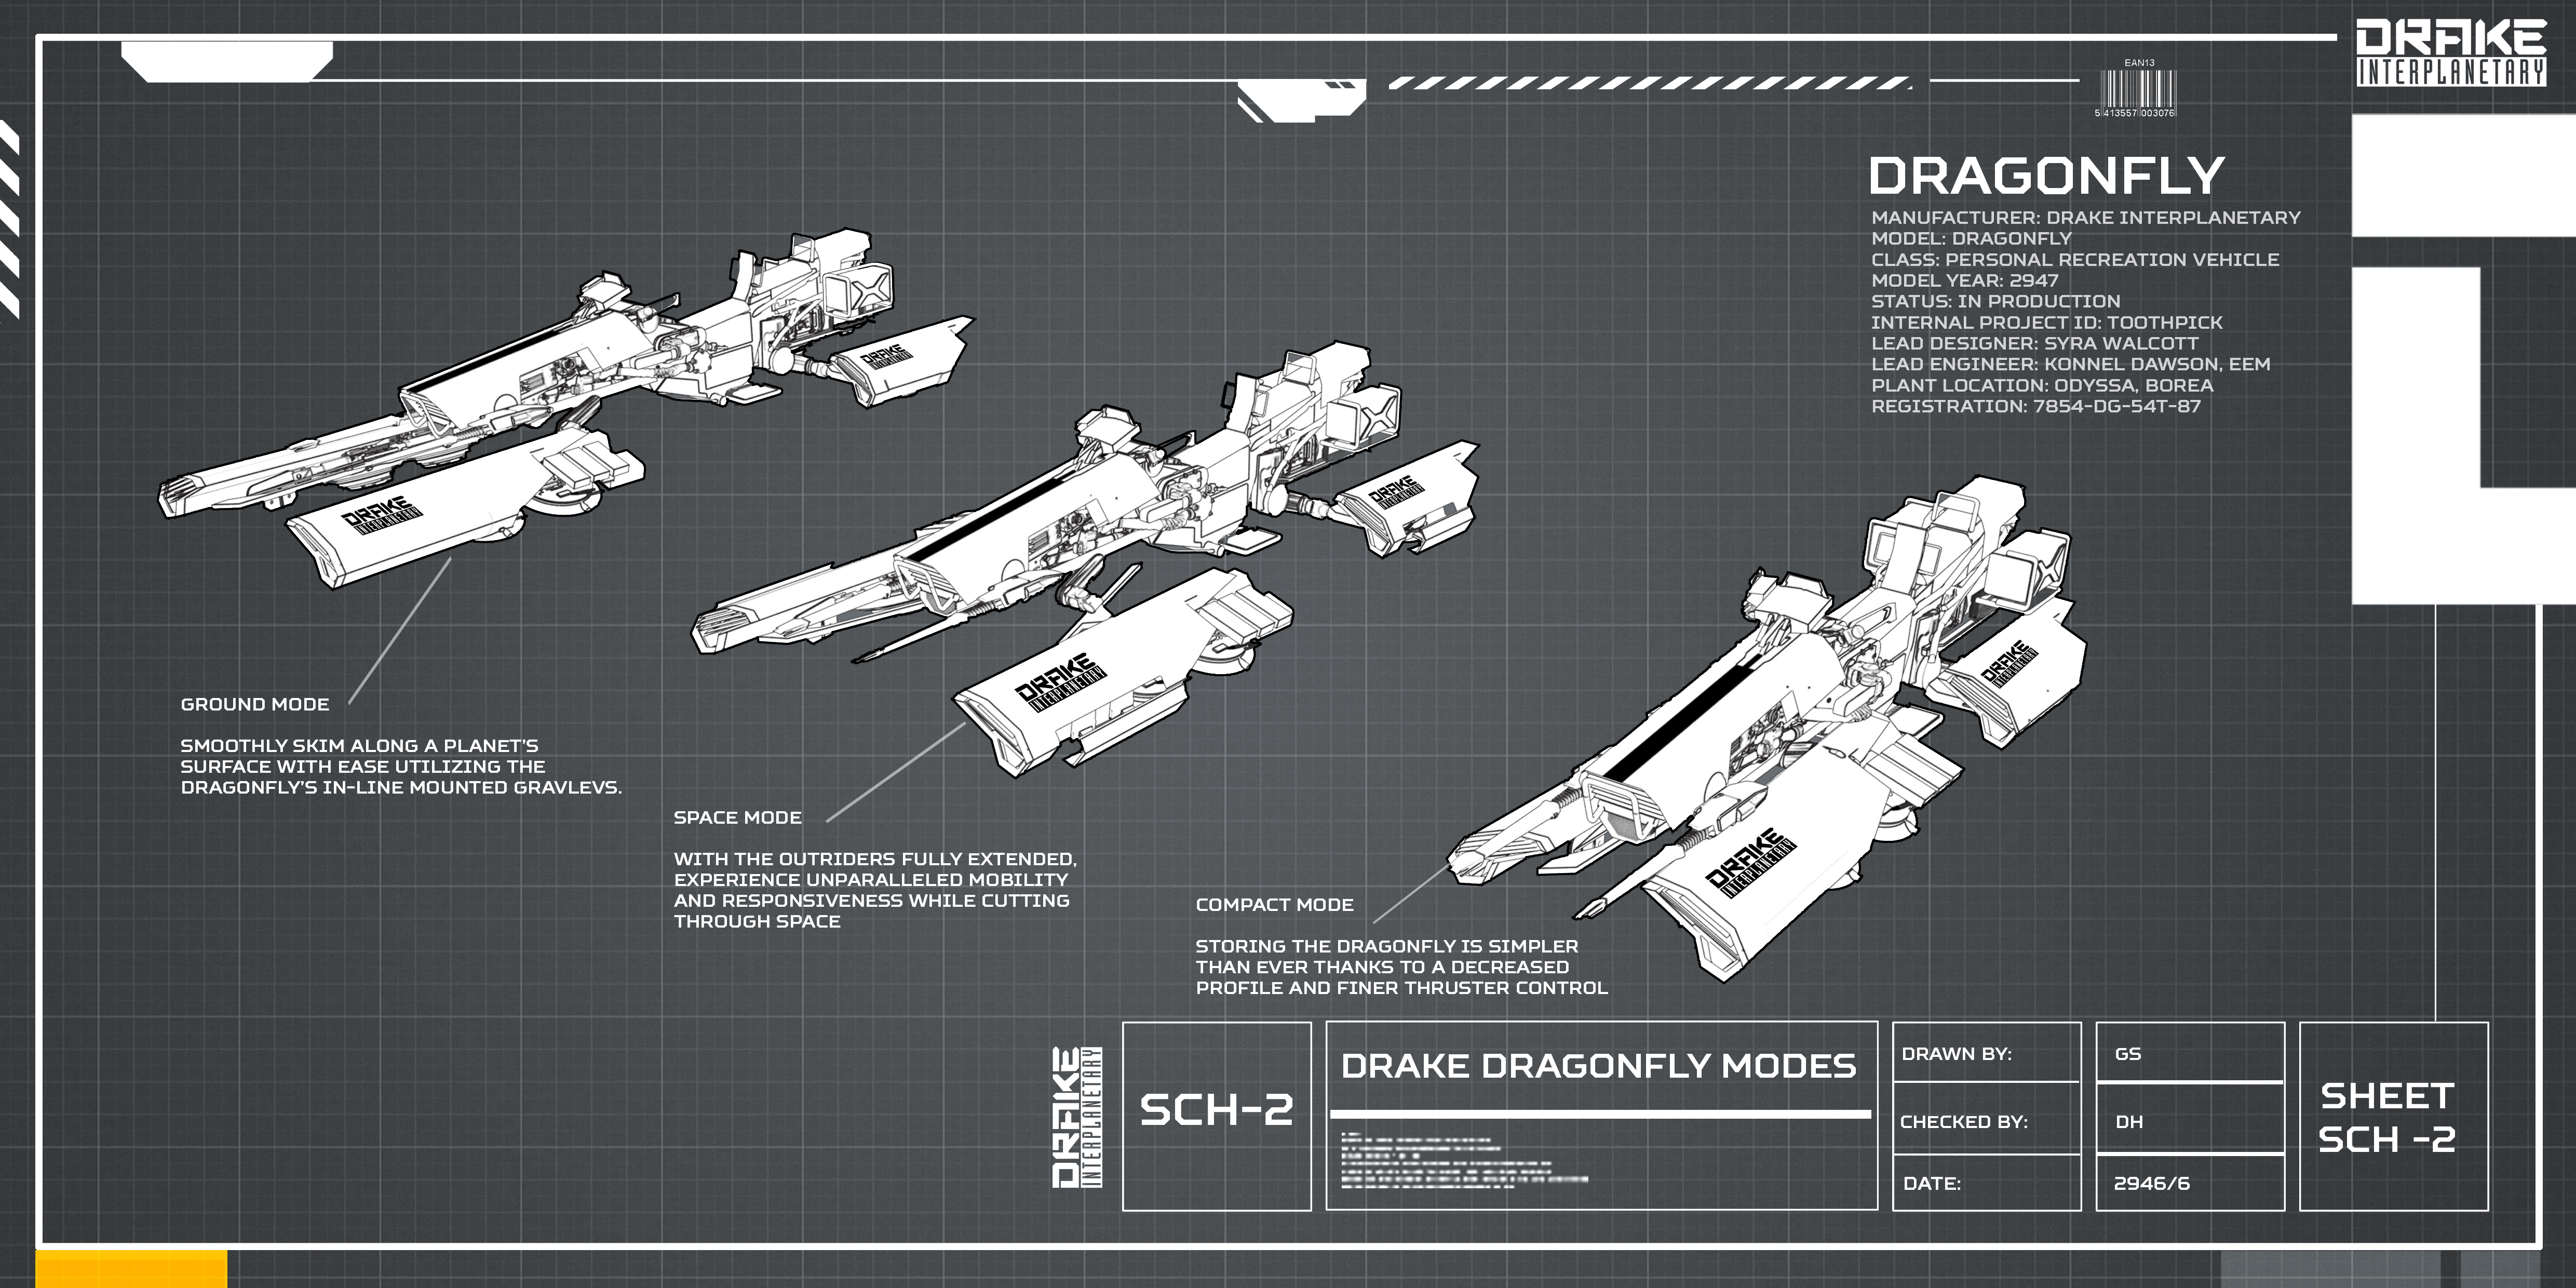 Drake_Dragonfly_Modes.jpg